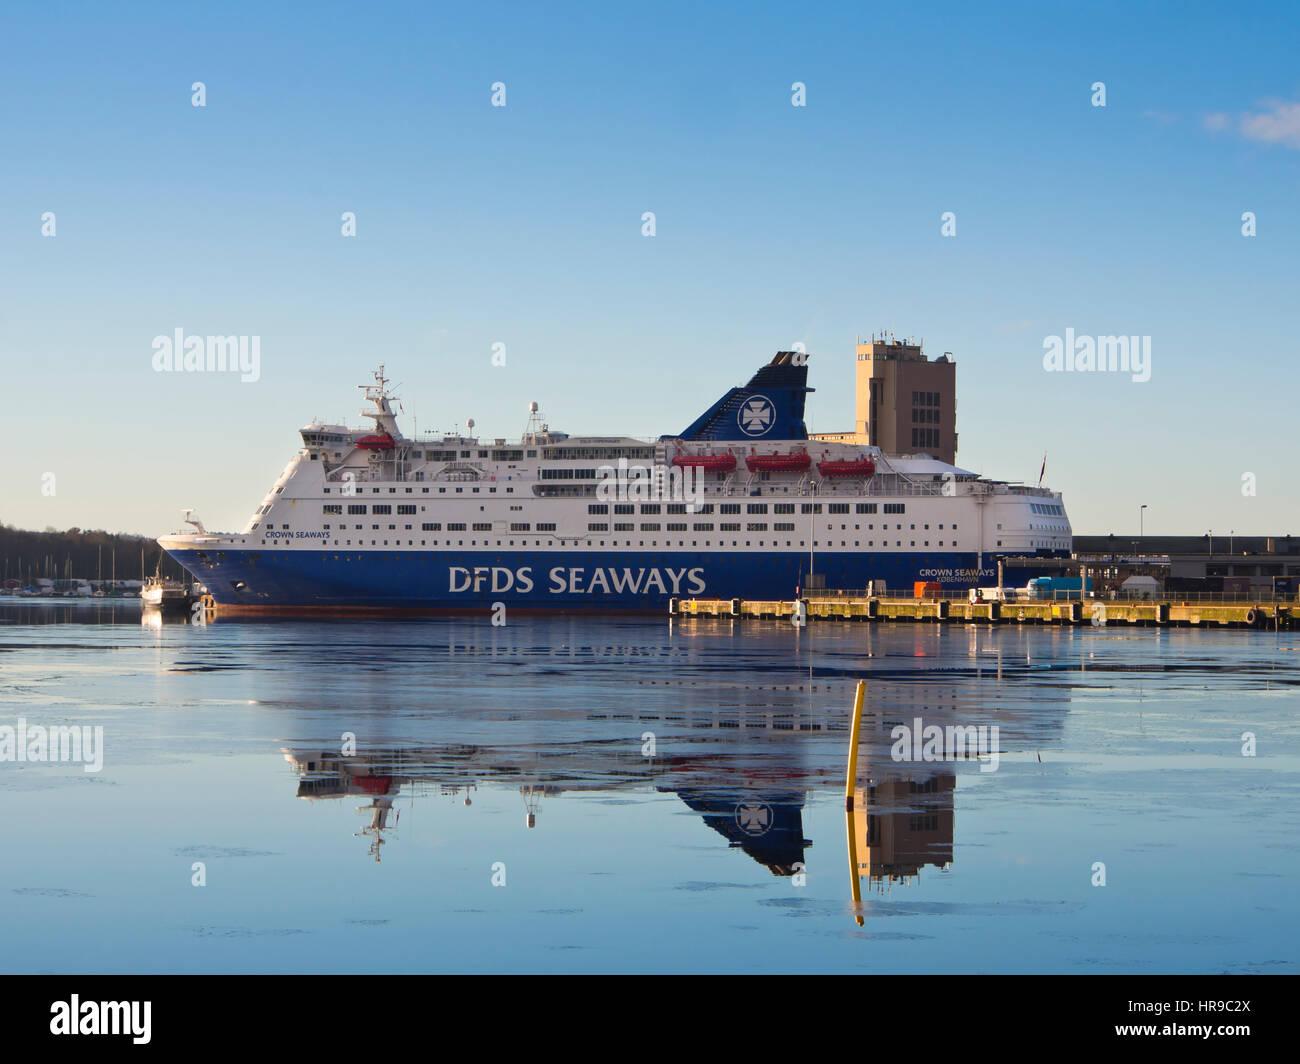 DFDS Seaways operate passenger and car ferries between the Scandinavian capitals Copenhagen and Oslo, here docked - Stock Image